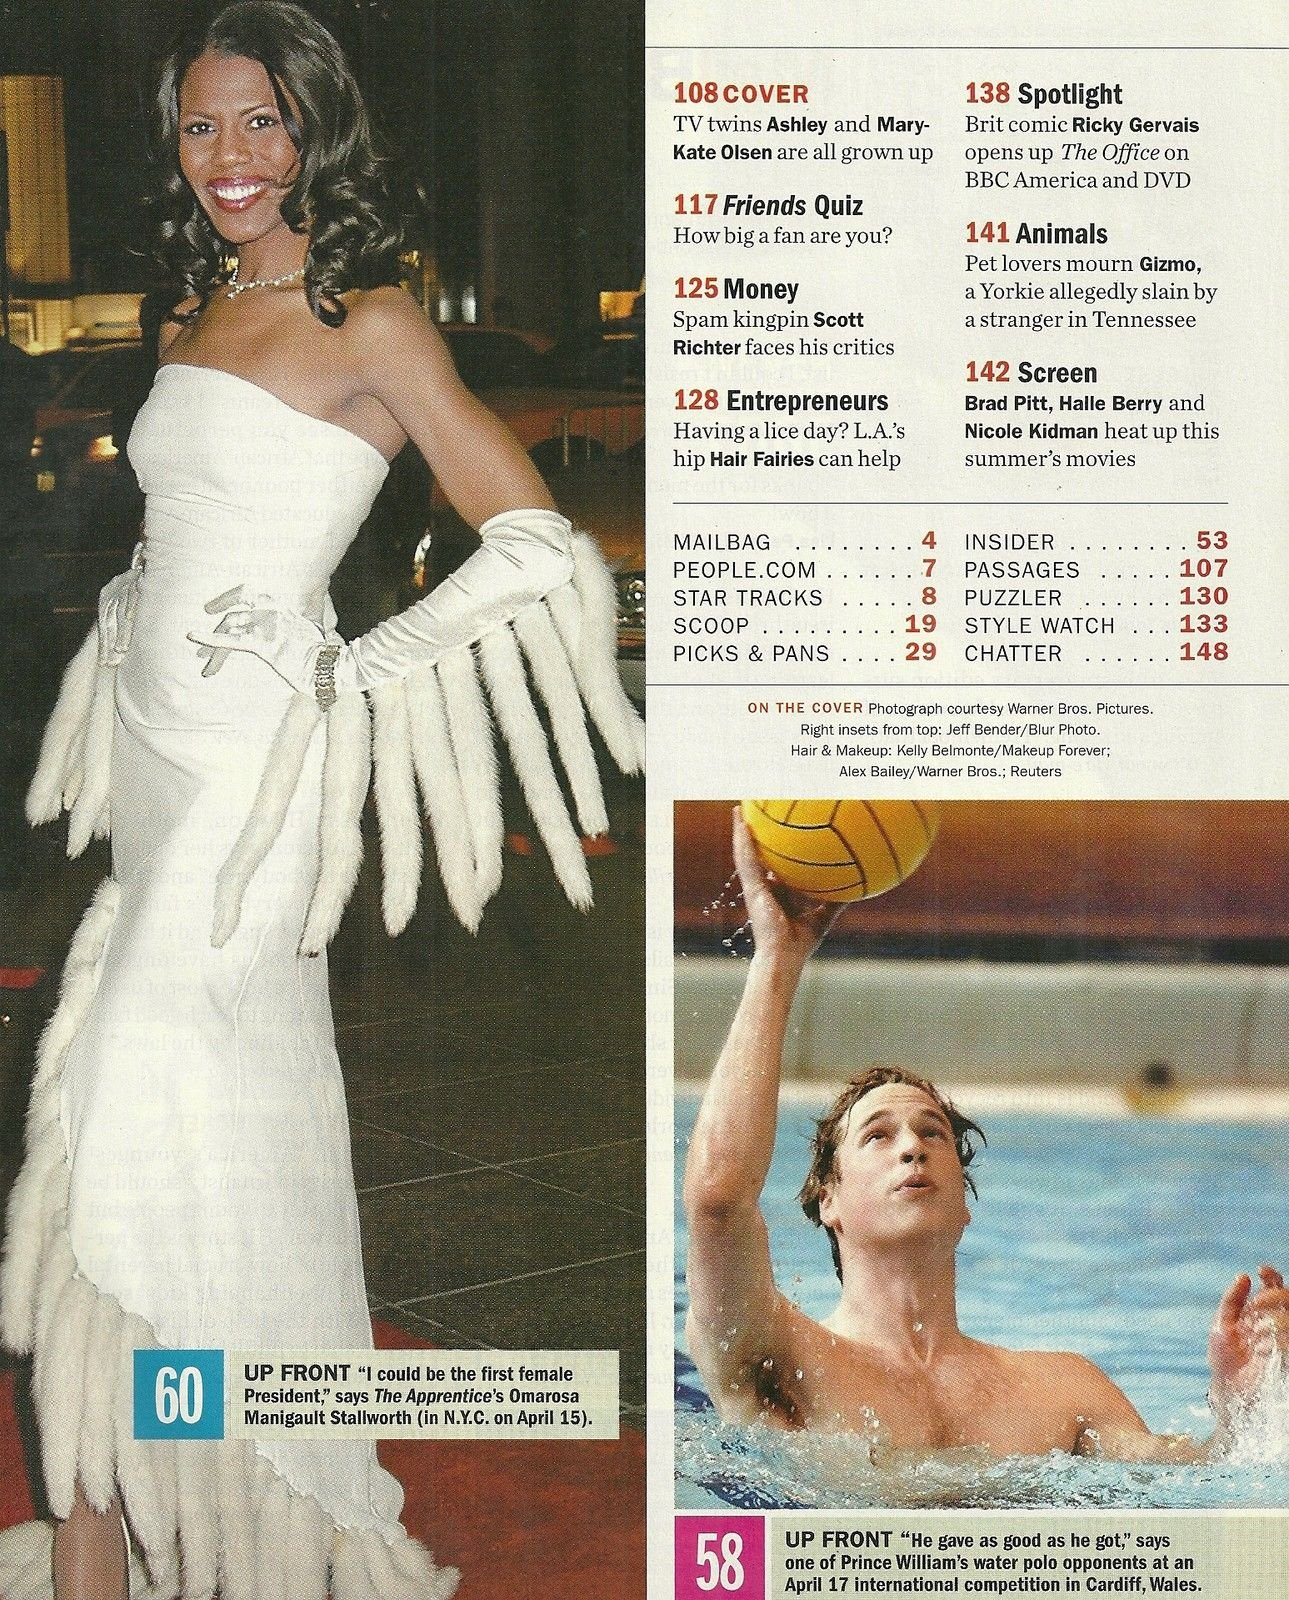 Mary-Kate & Ashley Olsen, Omarosa Manigault, Brad Pitt, Prince William - May 3, 2004 People Magazine: Norman Pearlstine: Amazon.com: Books